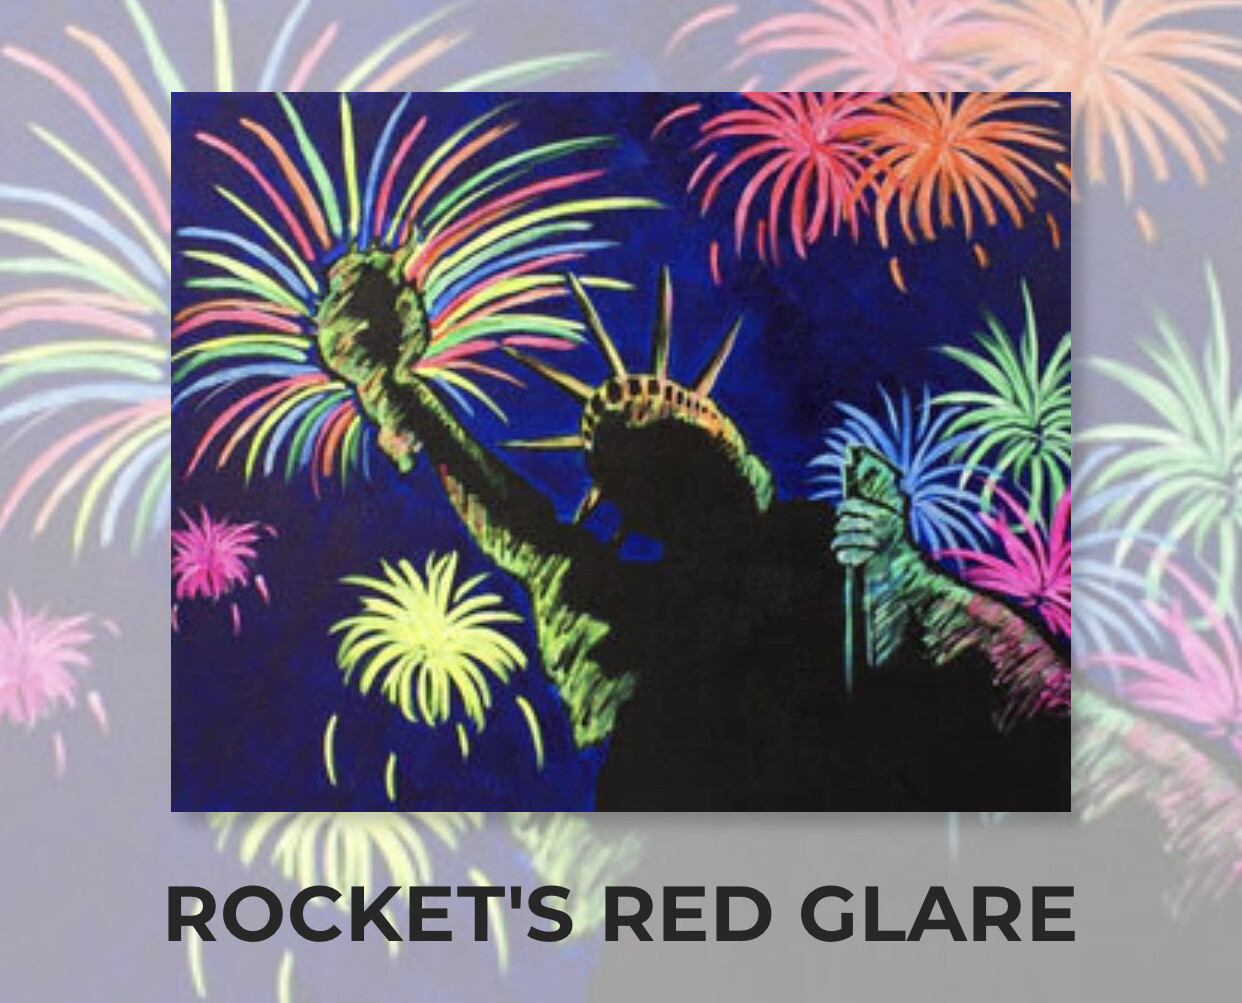 Rocket's Red Glare ADULT Acrylic Paint On Canvas DIY Art Kit